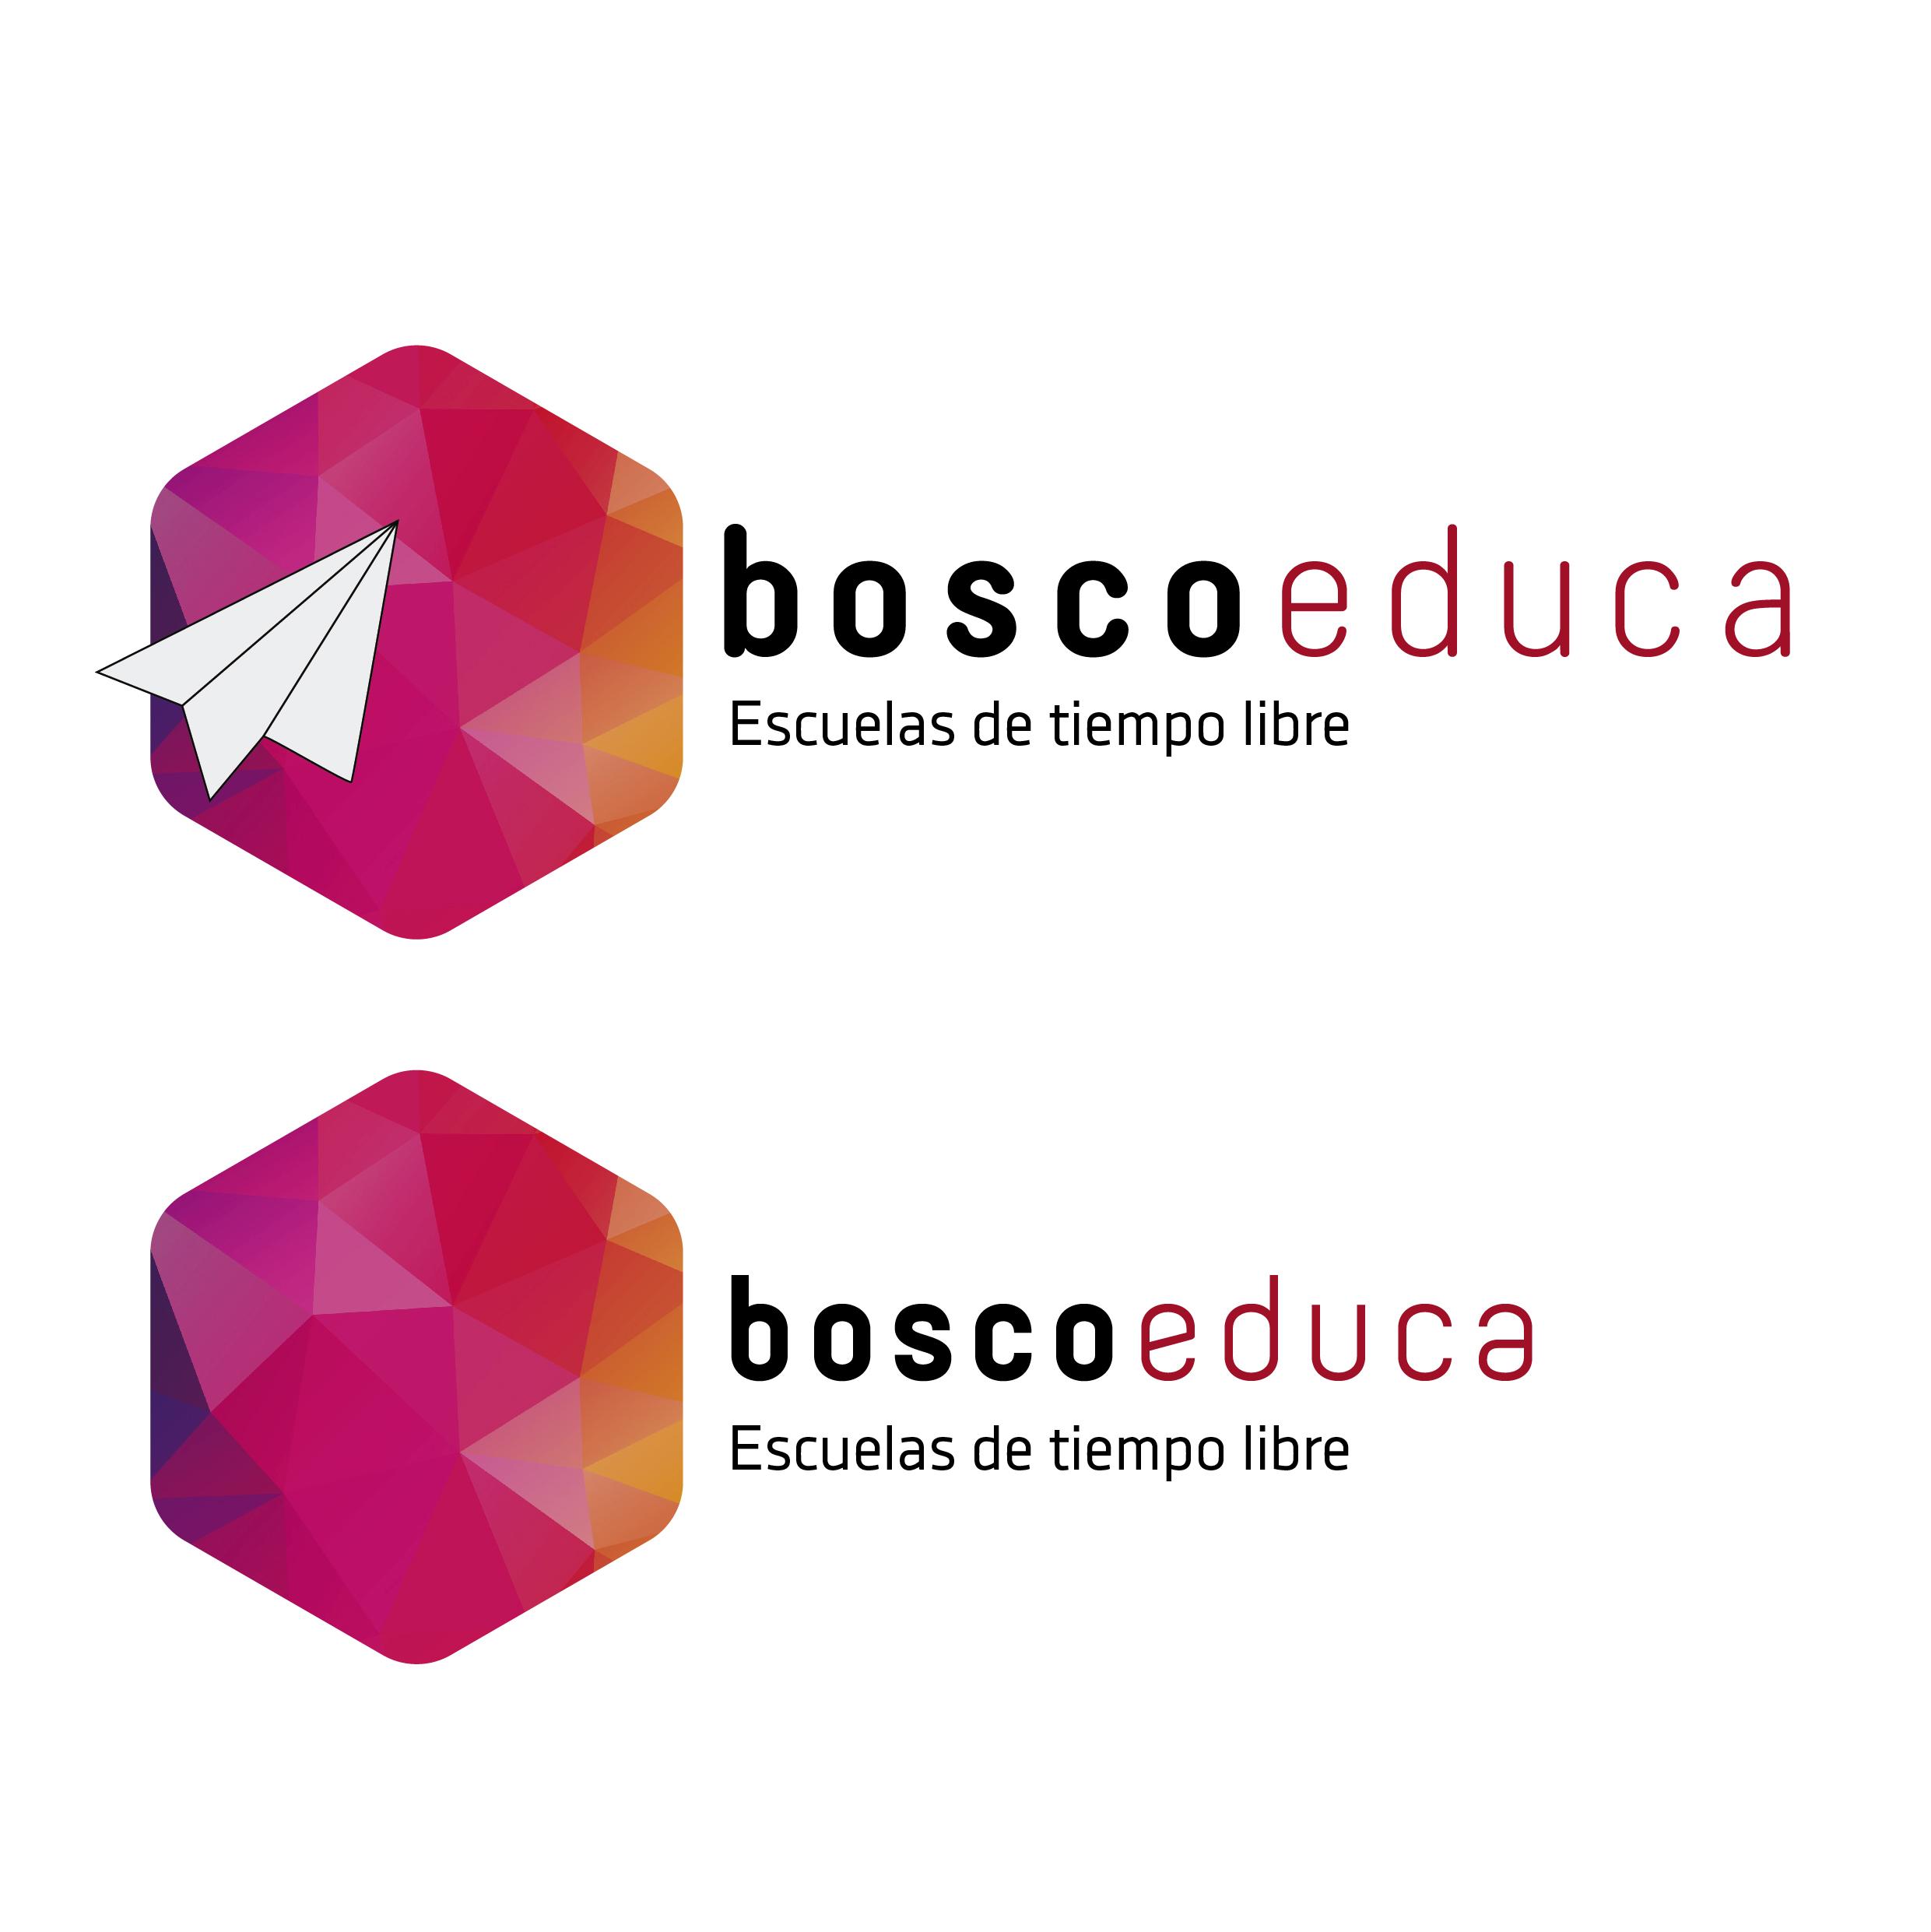 opción 3B_boscoeduca fractal.jpg